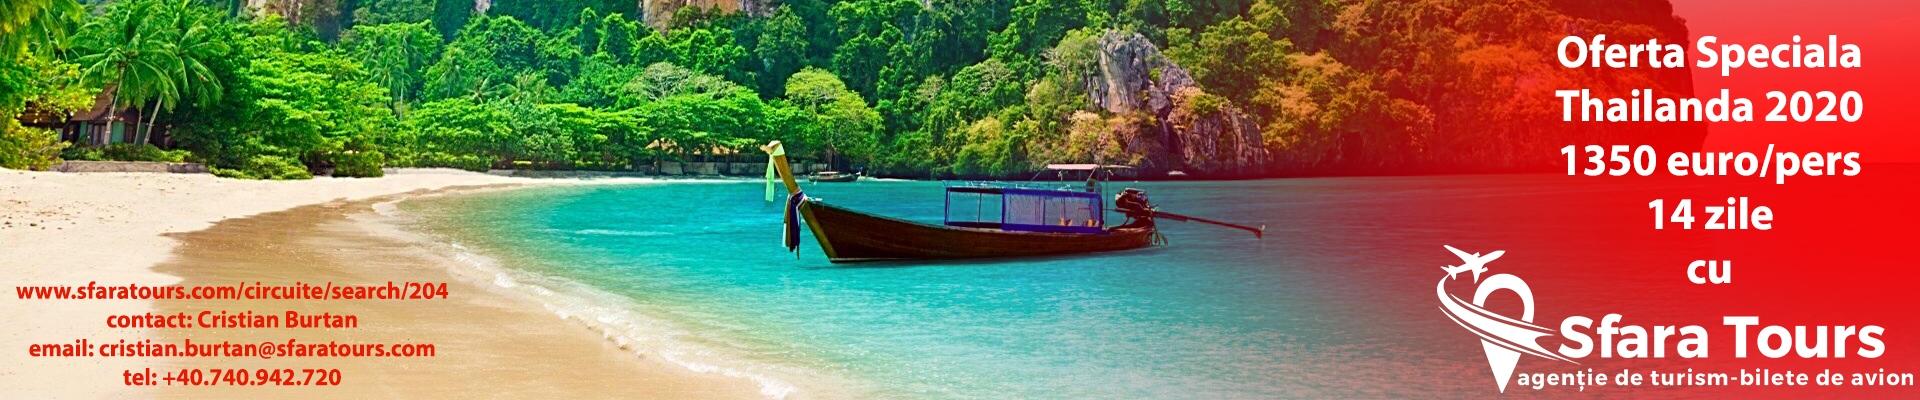 Thailanda cu Sfara